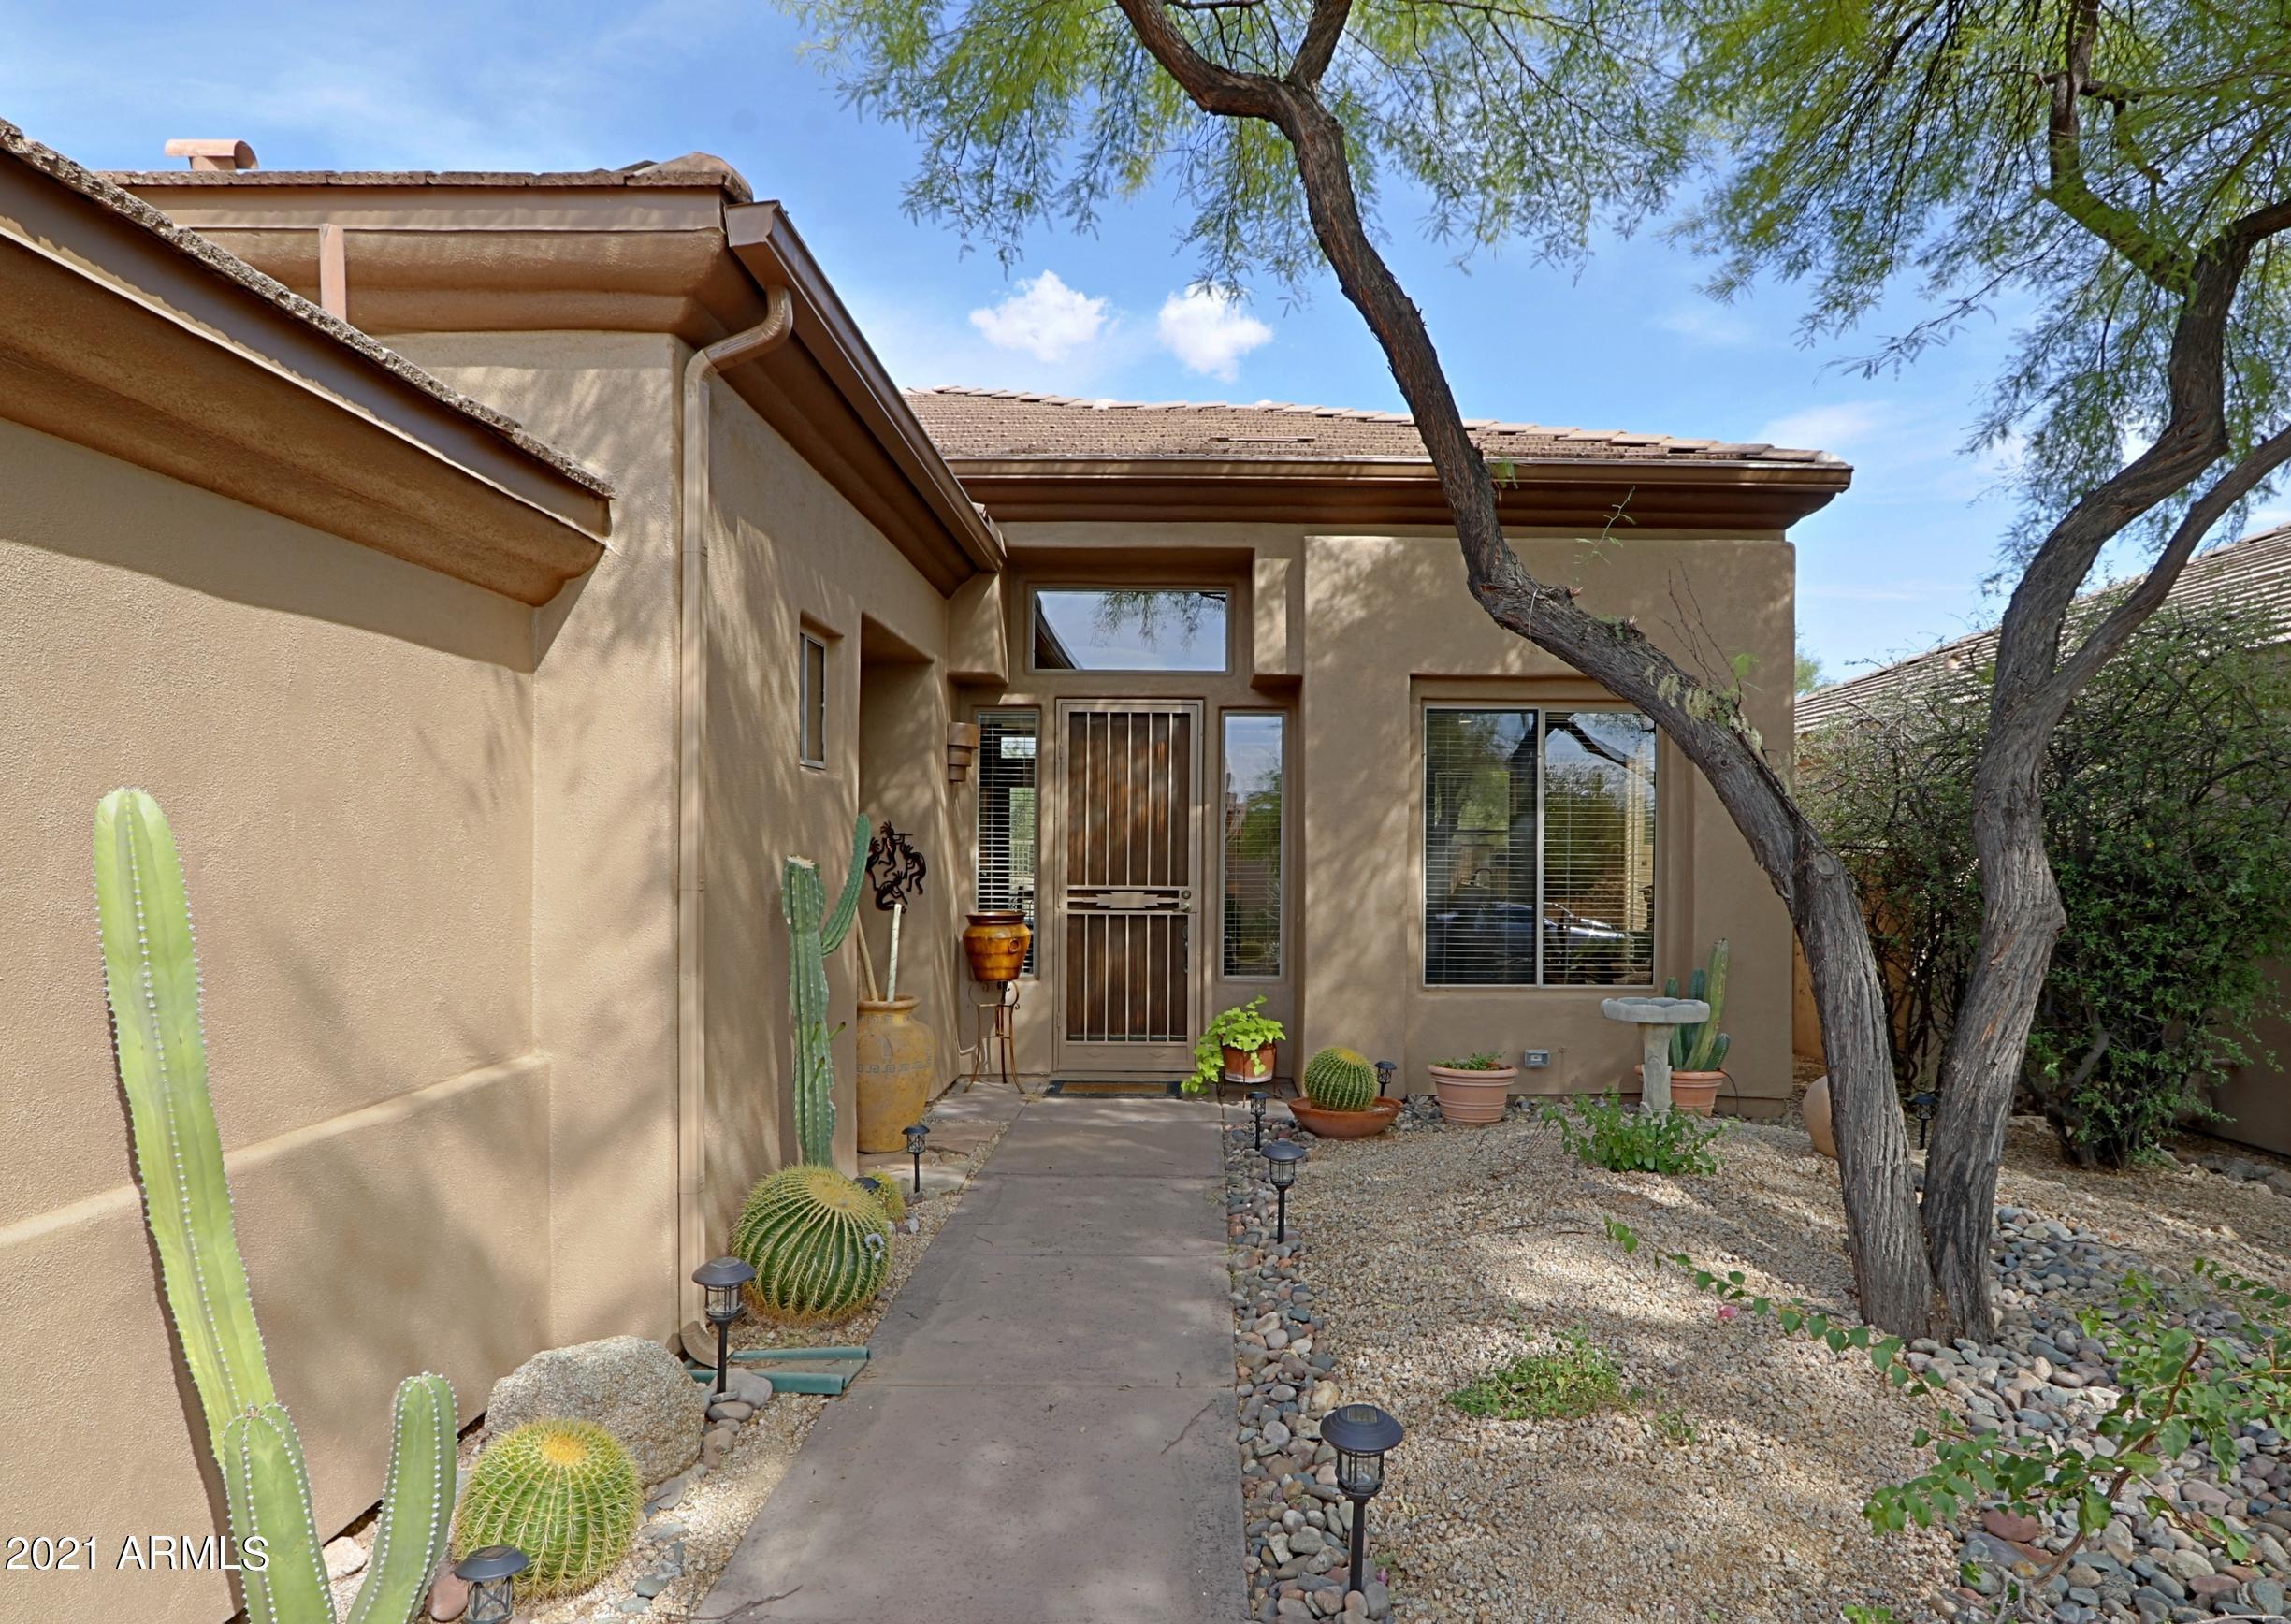 32811 N 70th Street, Scottsdale AZ 85266 - Photo 2